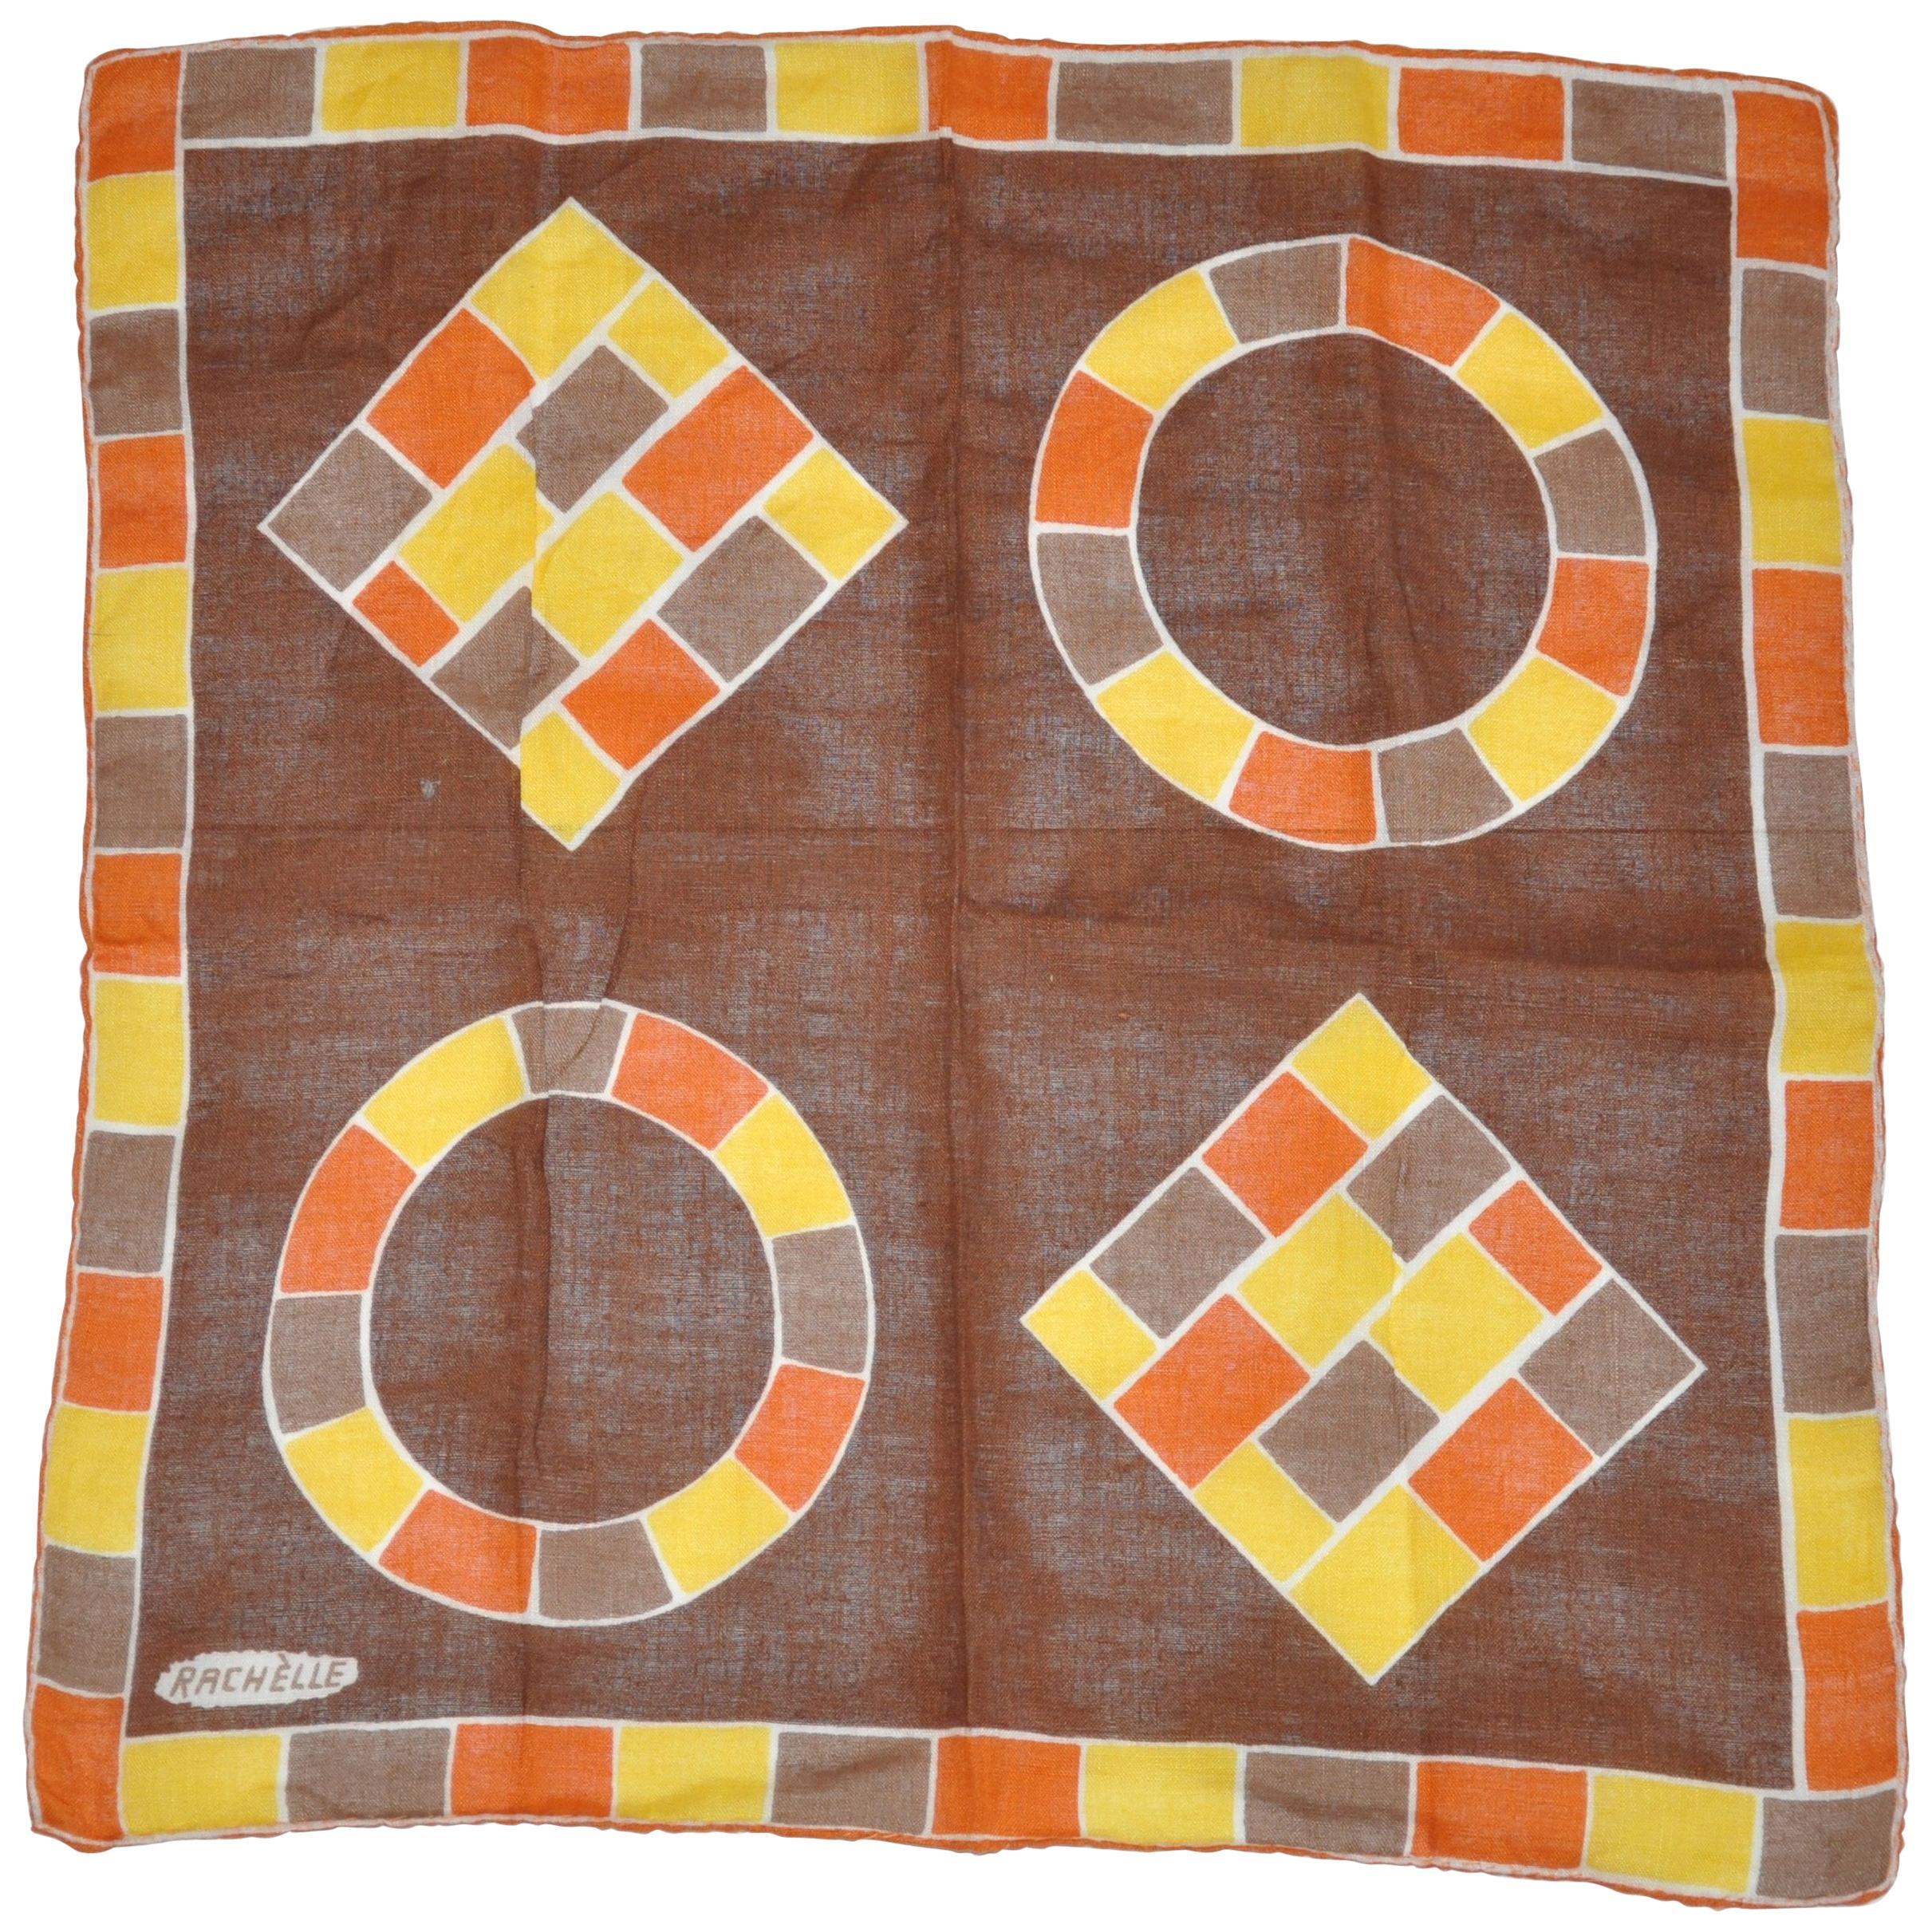 "Rachelle ""Autumn Shades Color Block"" Hand-Rolled Edges Swiss Cotton Handkerchief"